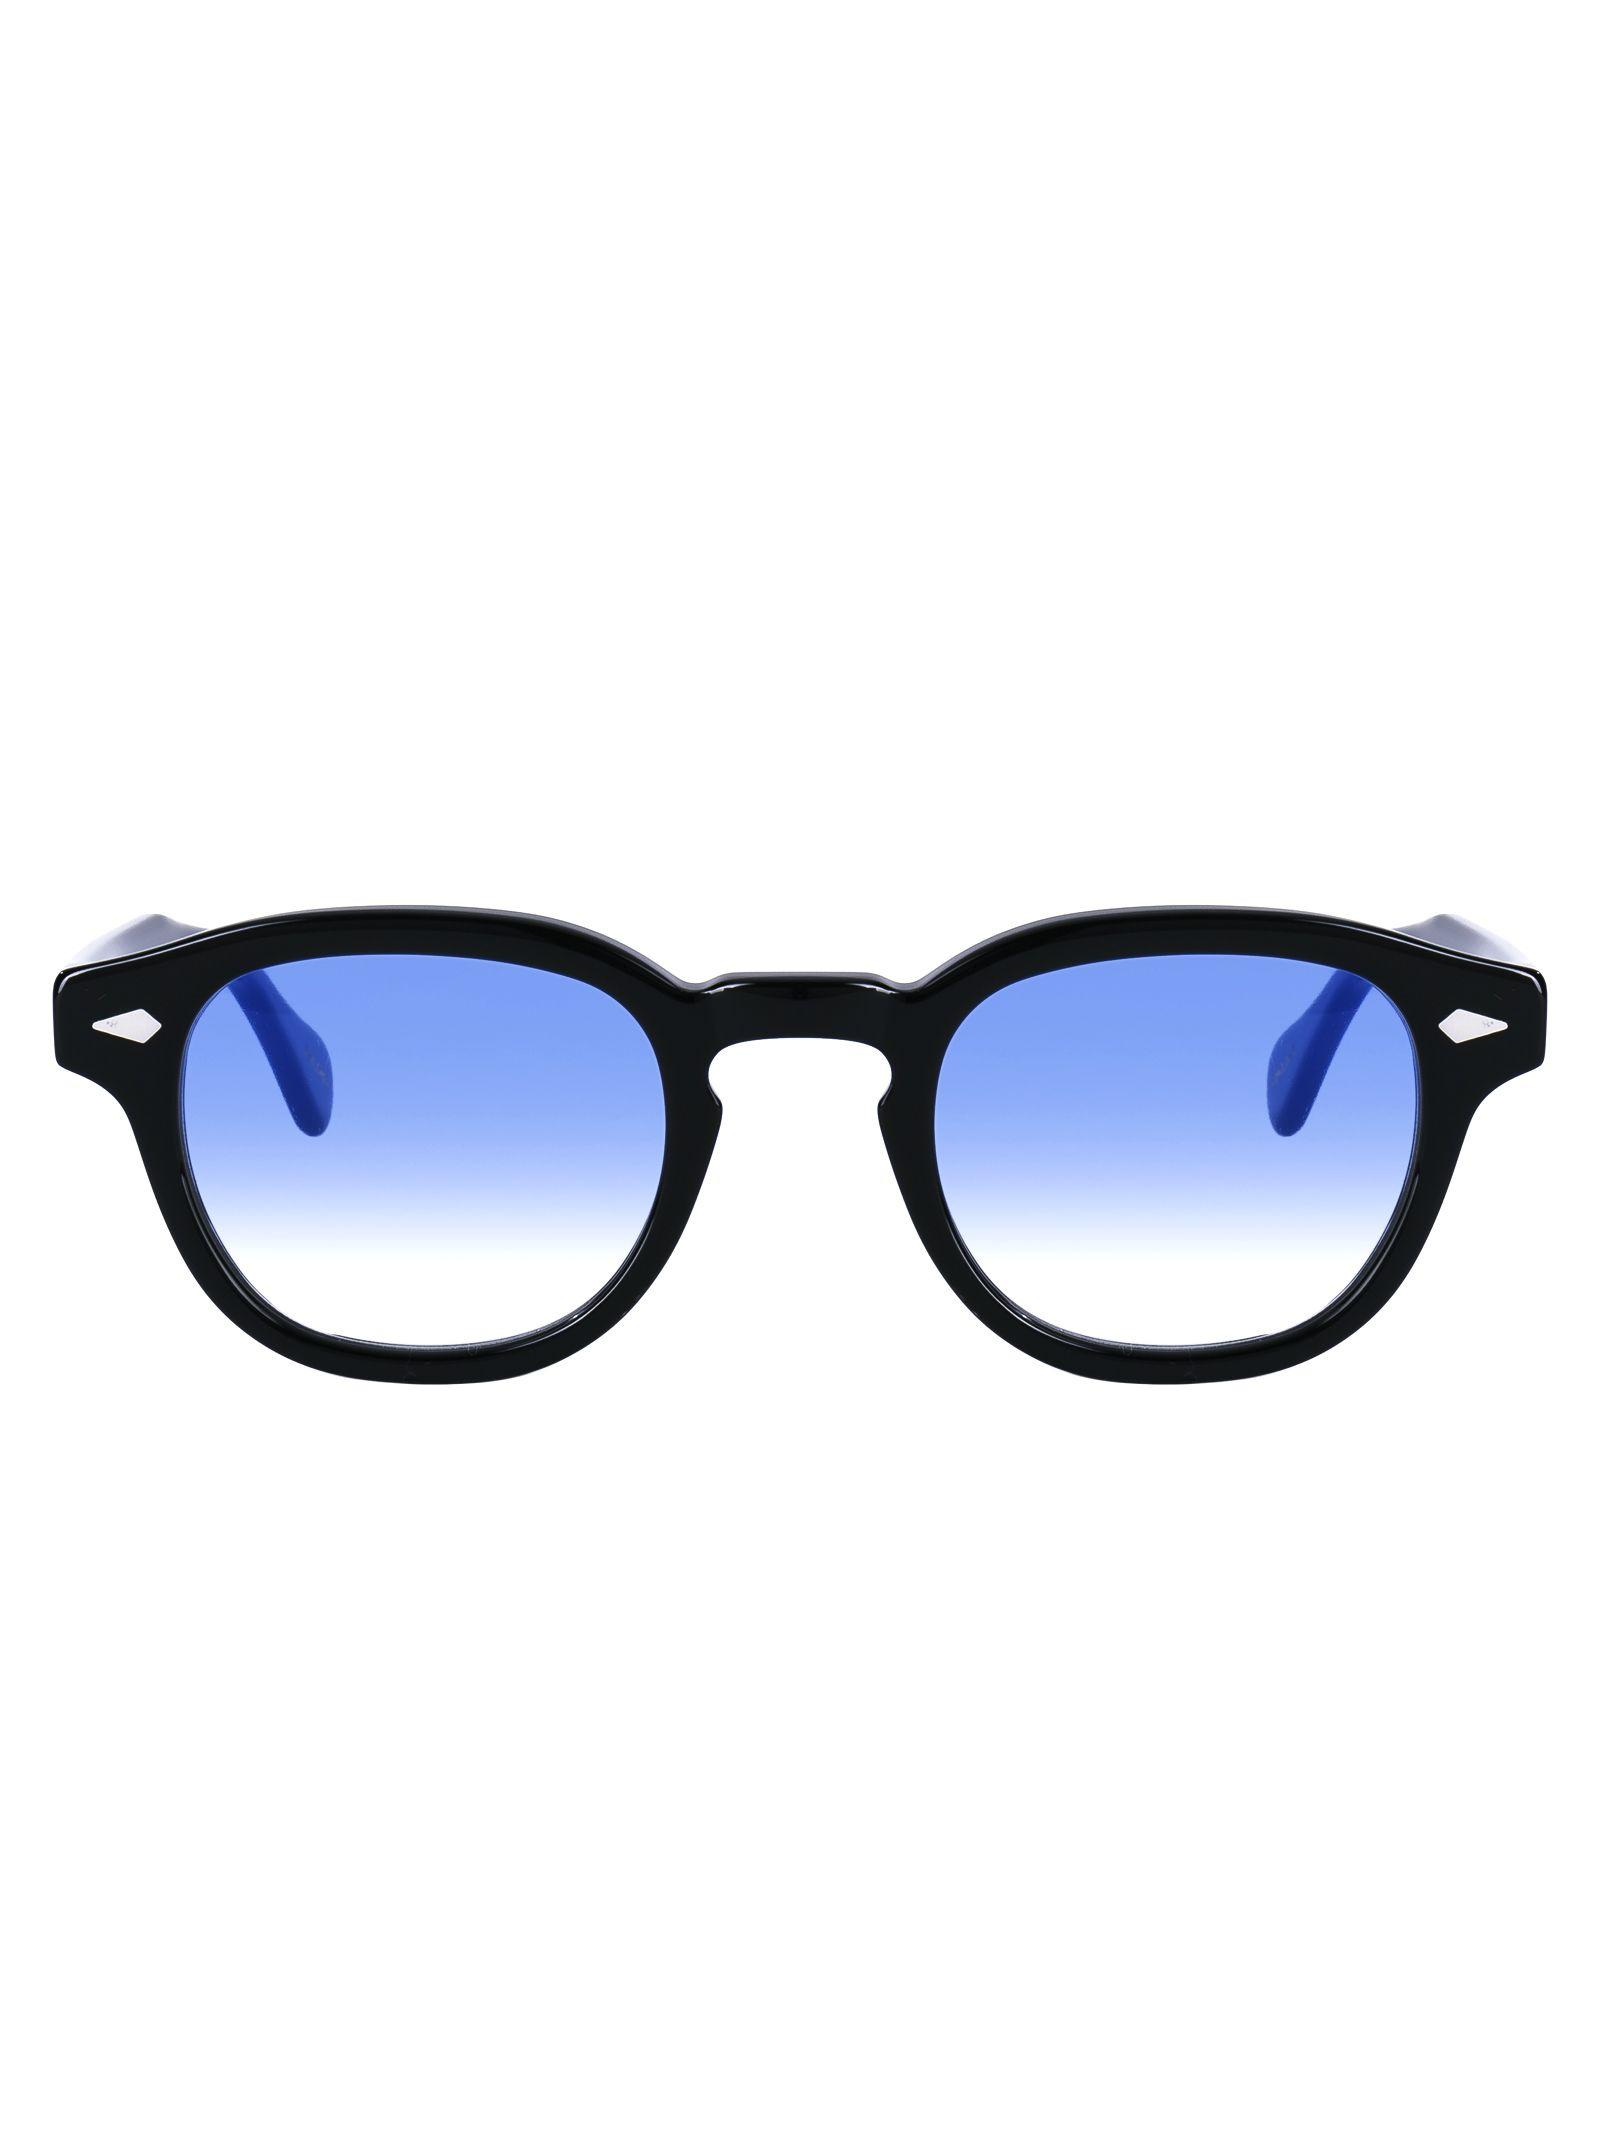 b3684dcd2c49 Moscot Lemtosh Sunglasses In Blackblueshade   ModeSens